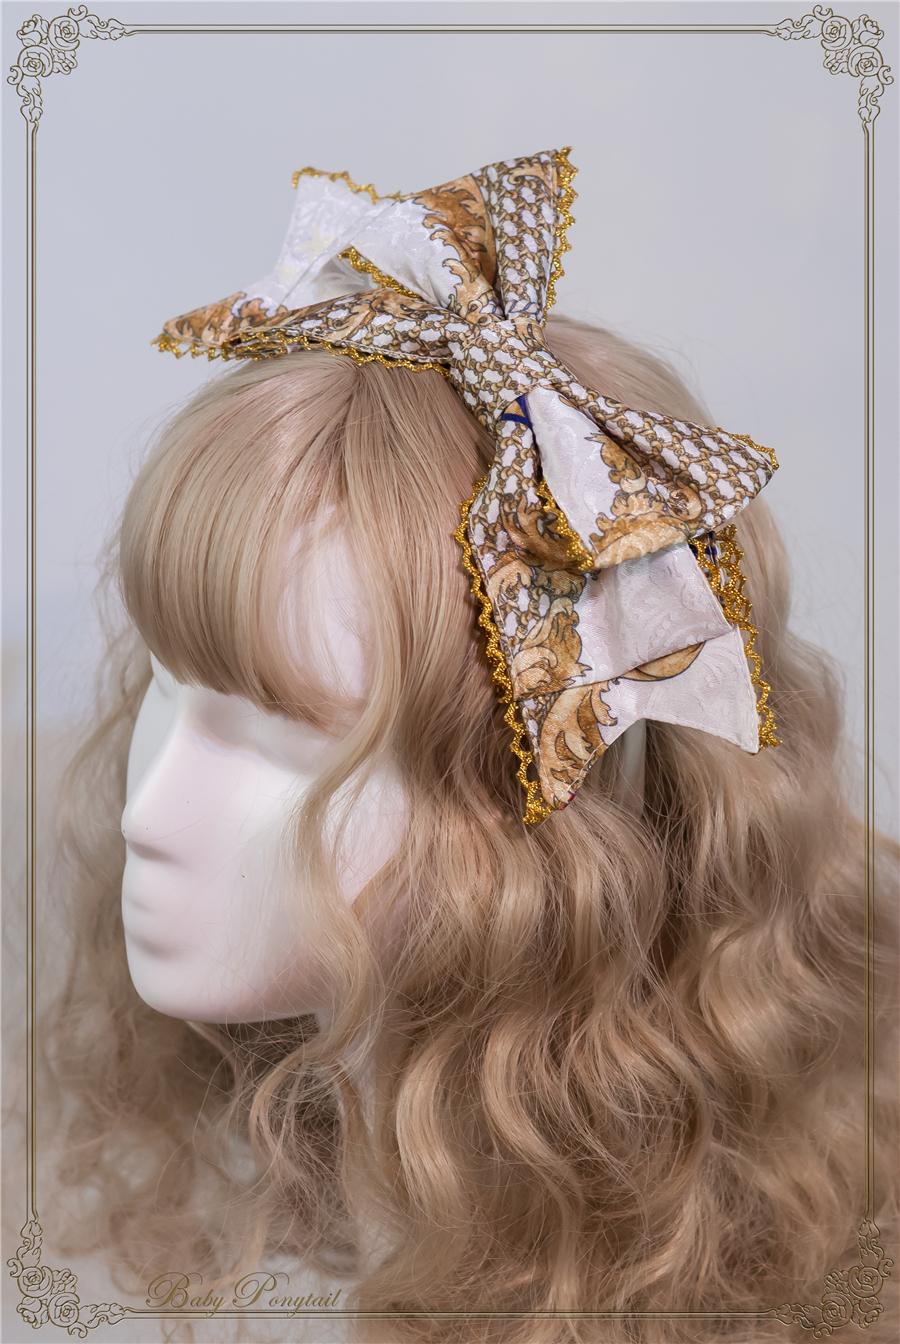 Baby Ponytail_Stock photo_Circus Princess_KC Silver_02.jpg